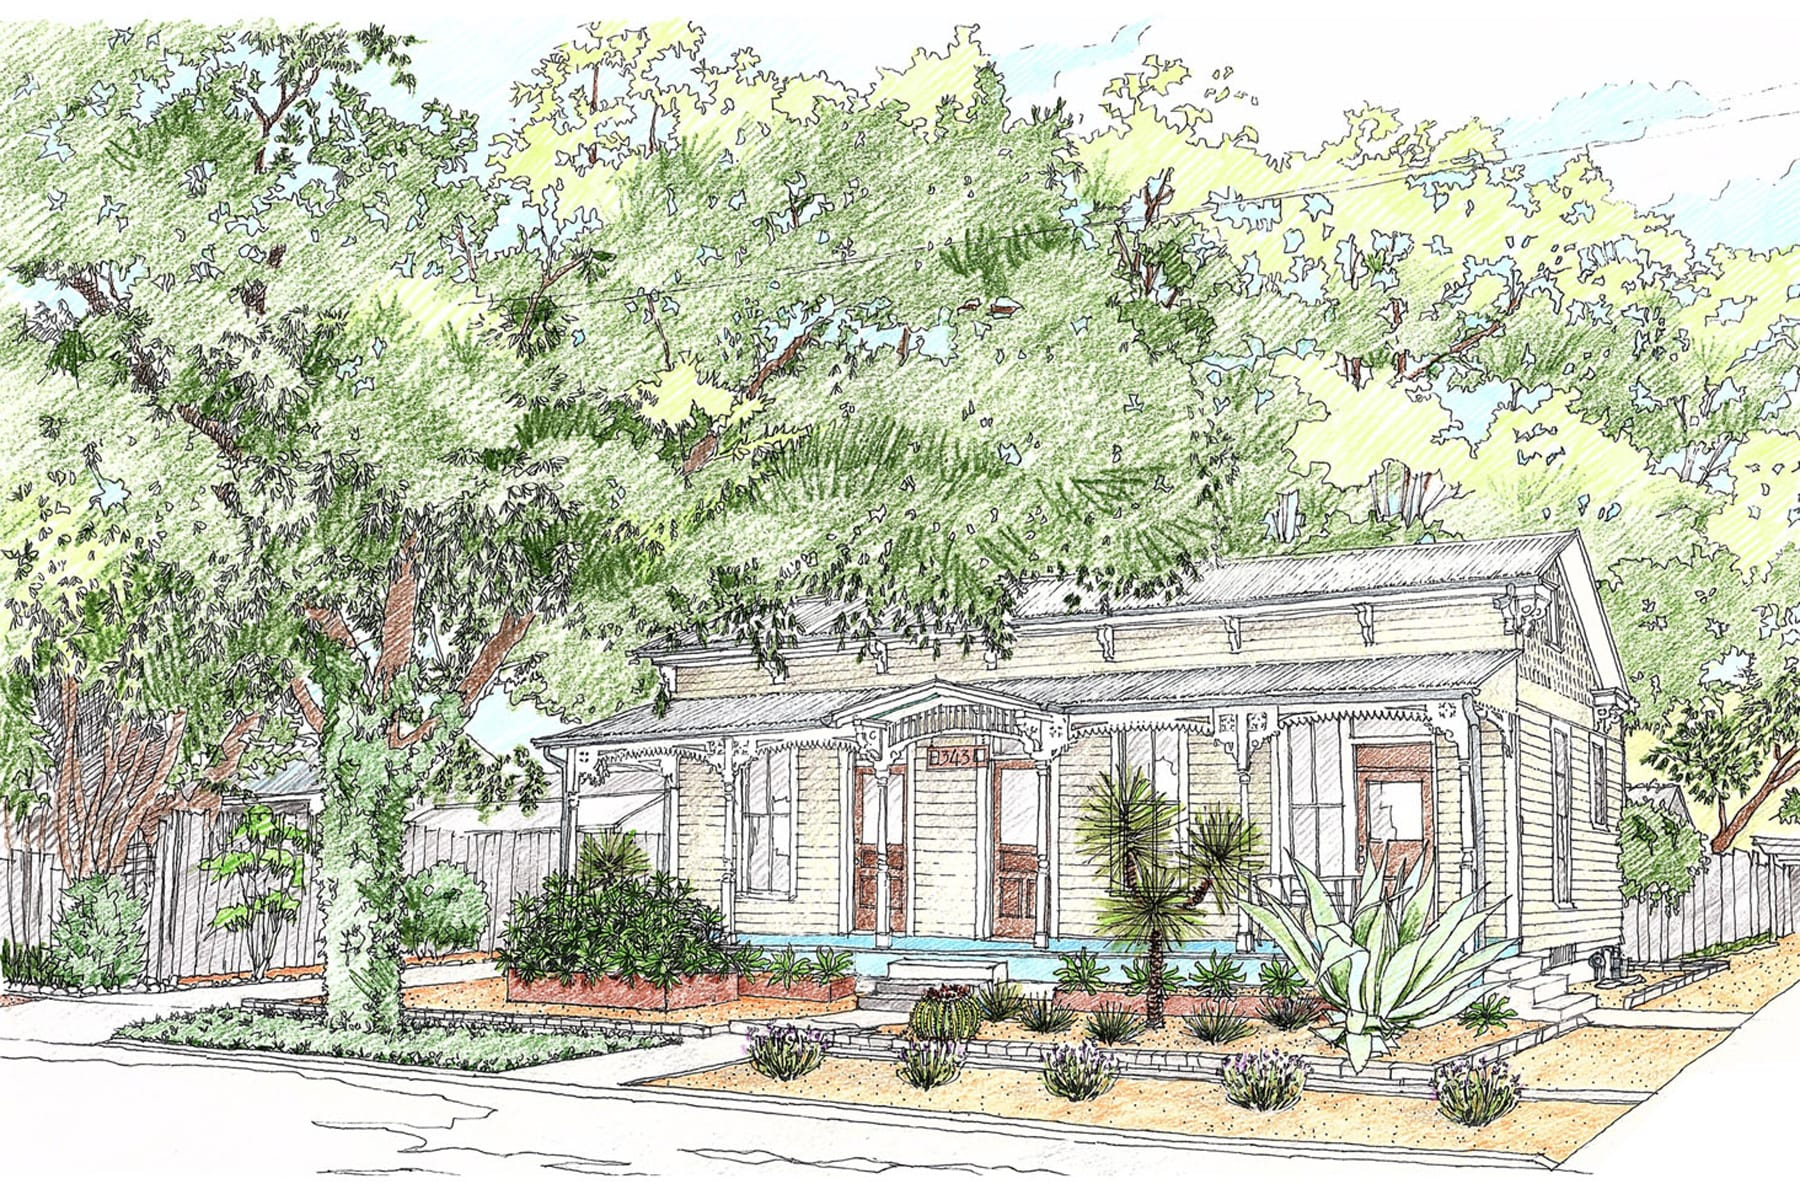 architectural landscape design rendering drawing